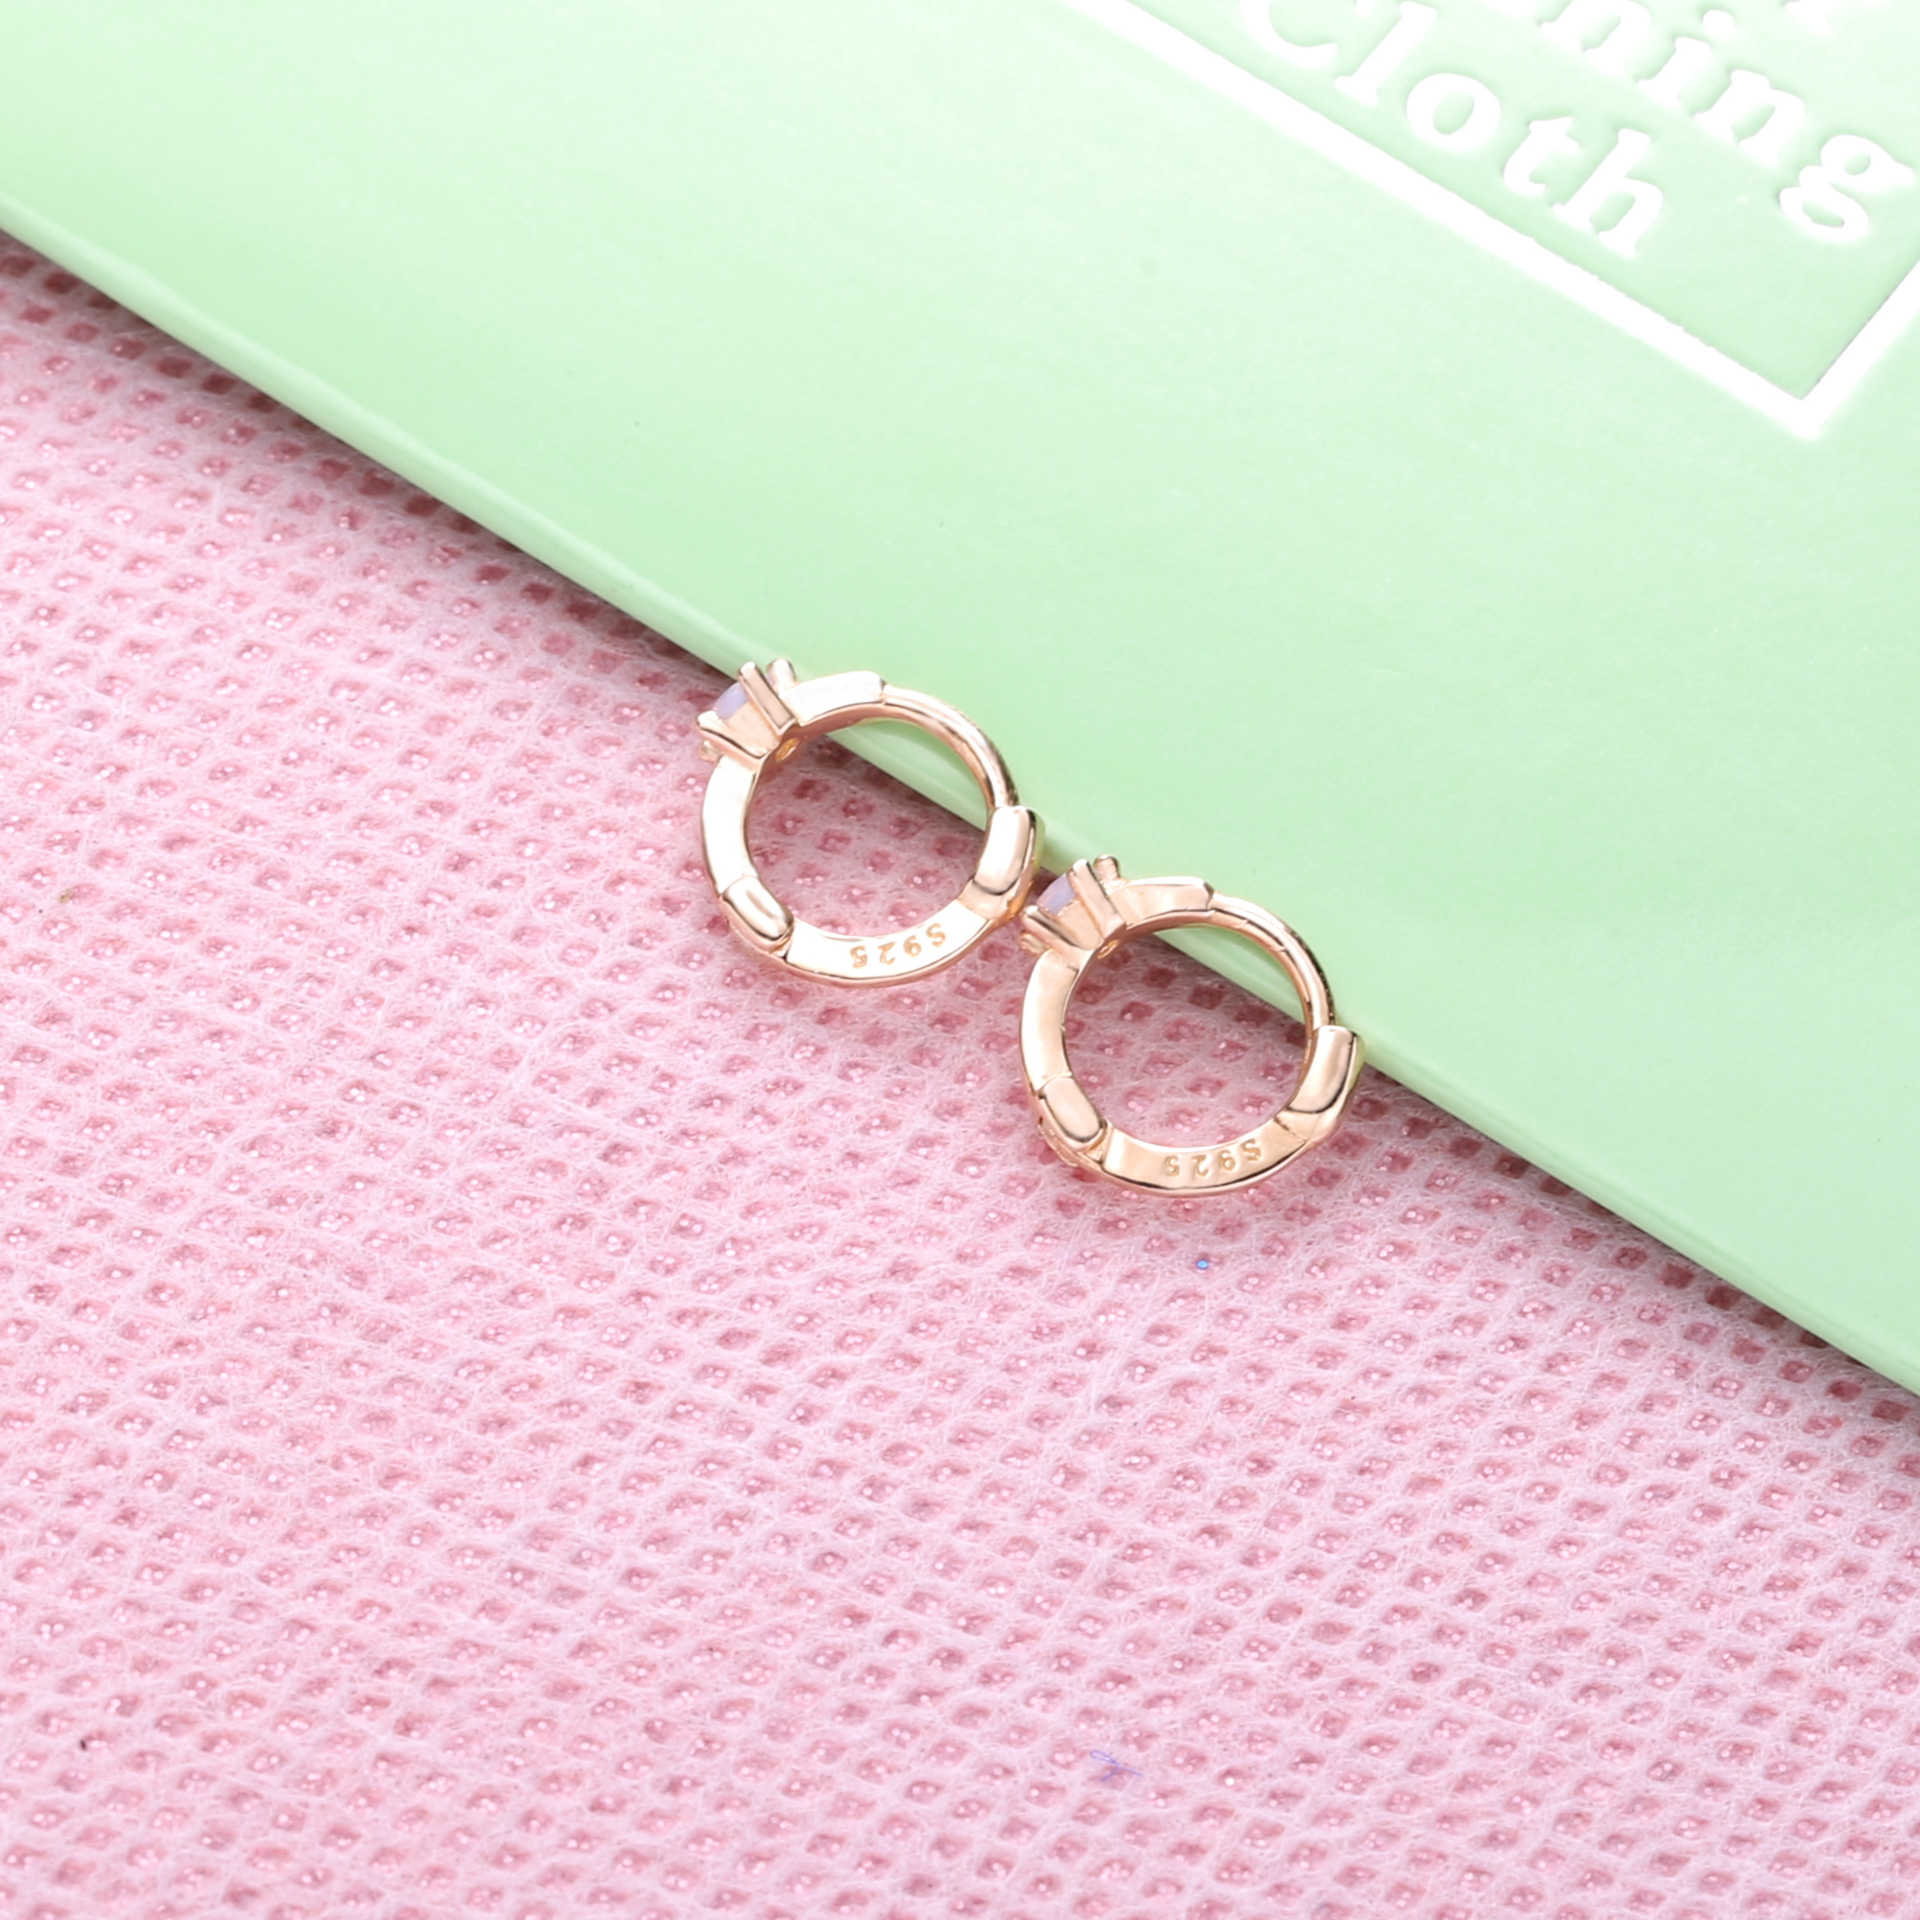 Slovecabin 925 Sterling Silver Opls Mini Huggies Lingkaran Anting-Anting Loop Lingkaran CZ Telinga Warna Emas Wanita Pernyataan Perhiasan